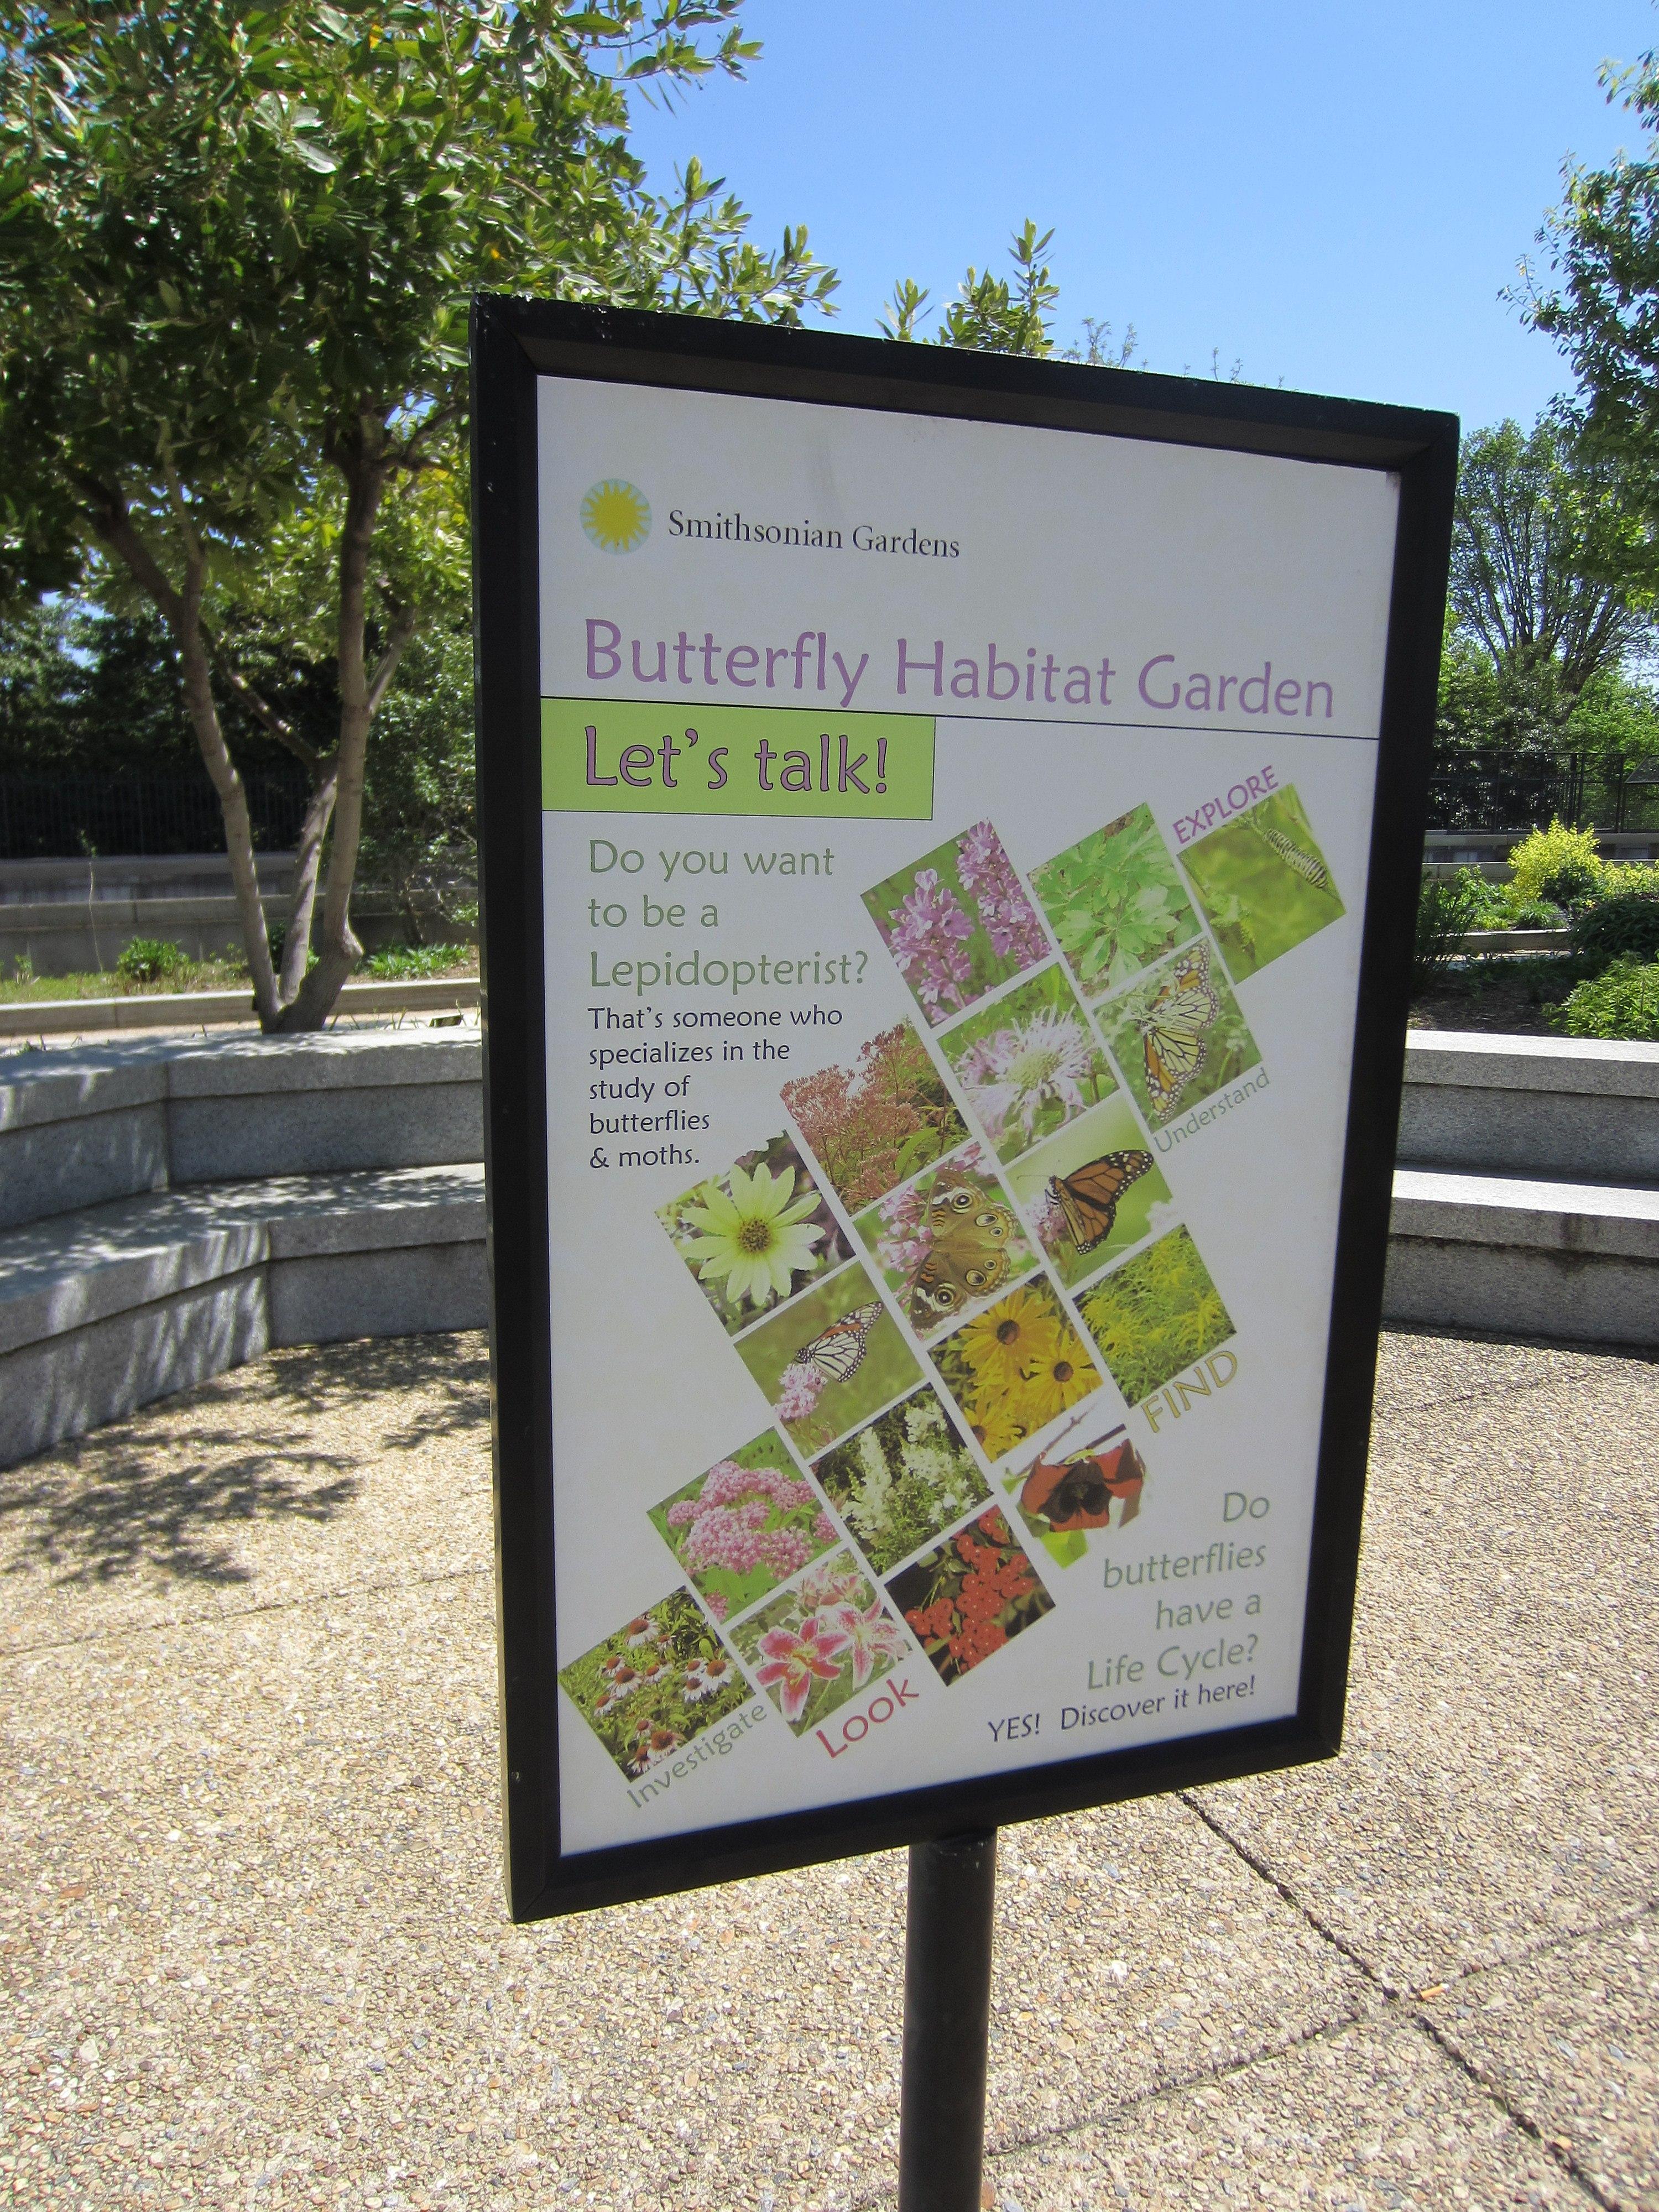 File:Smithsonian Garden   Butterfly Habitat Garden, Washington, D.C.  2013.JPG